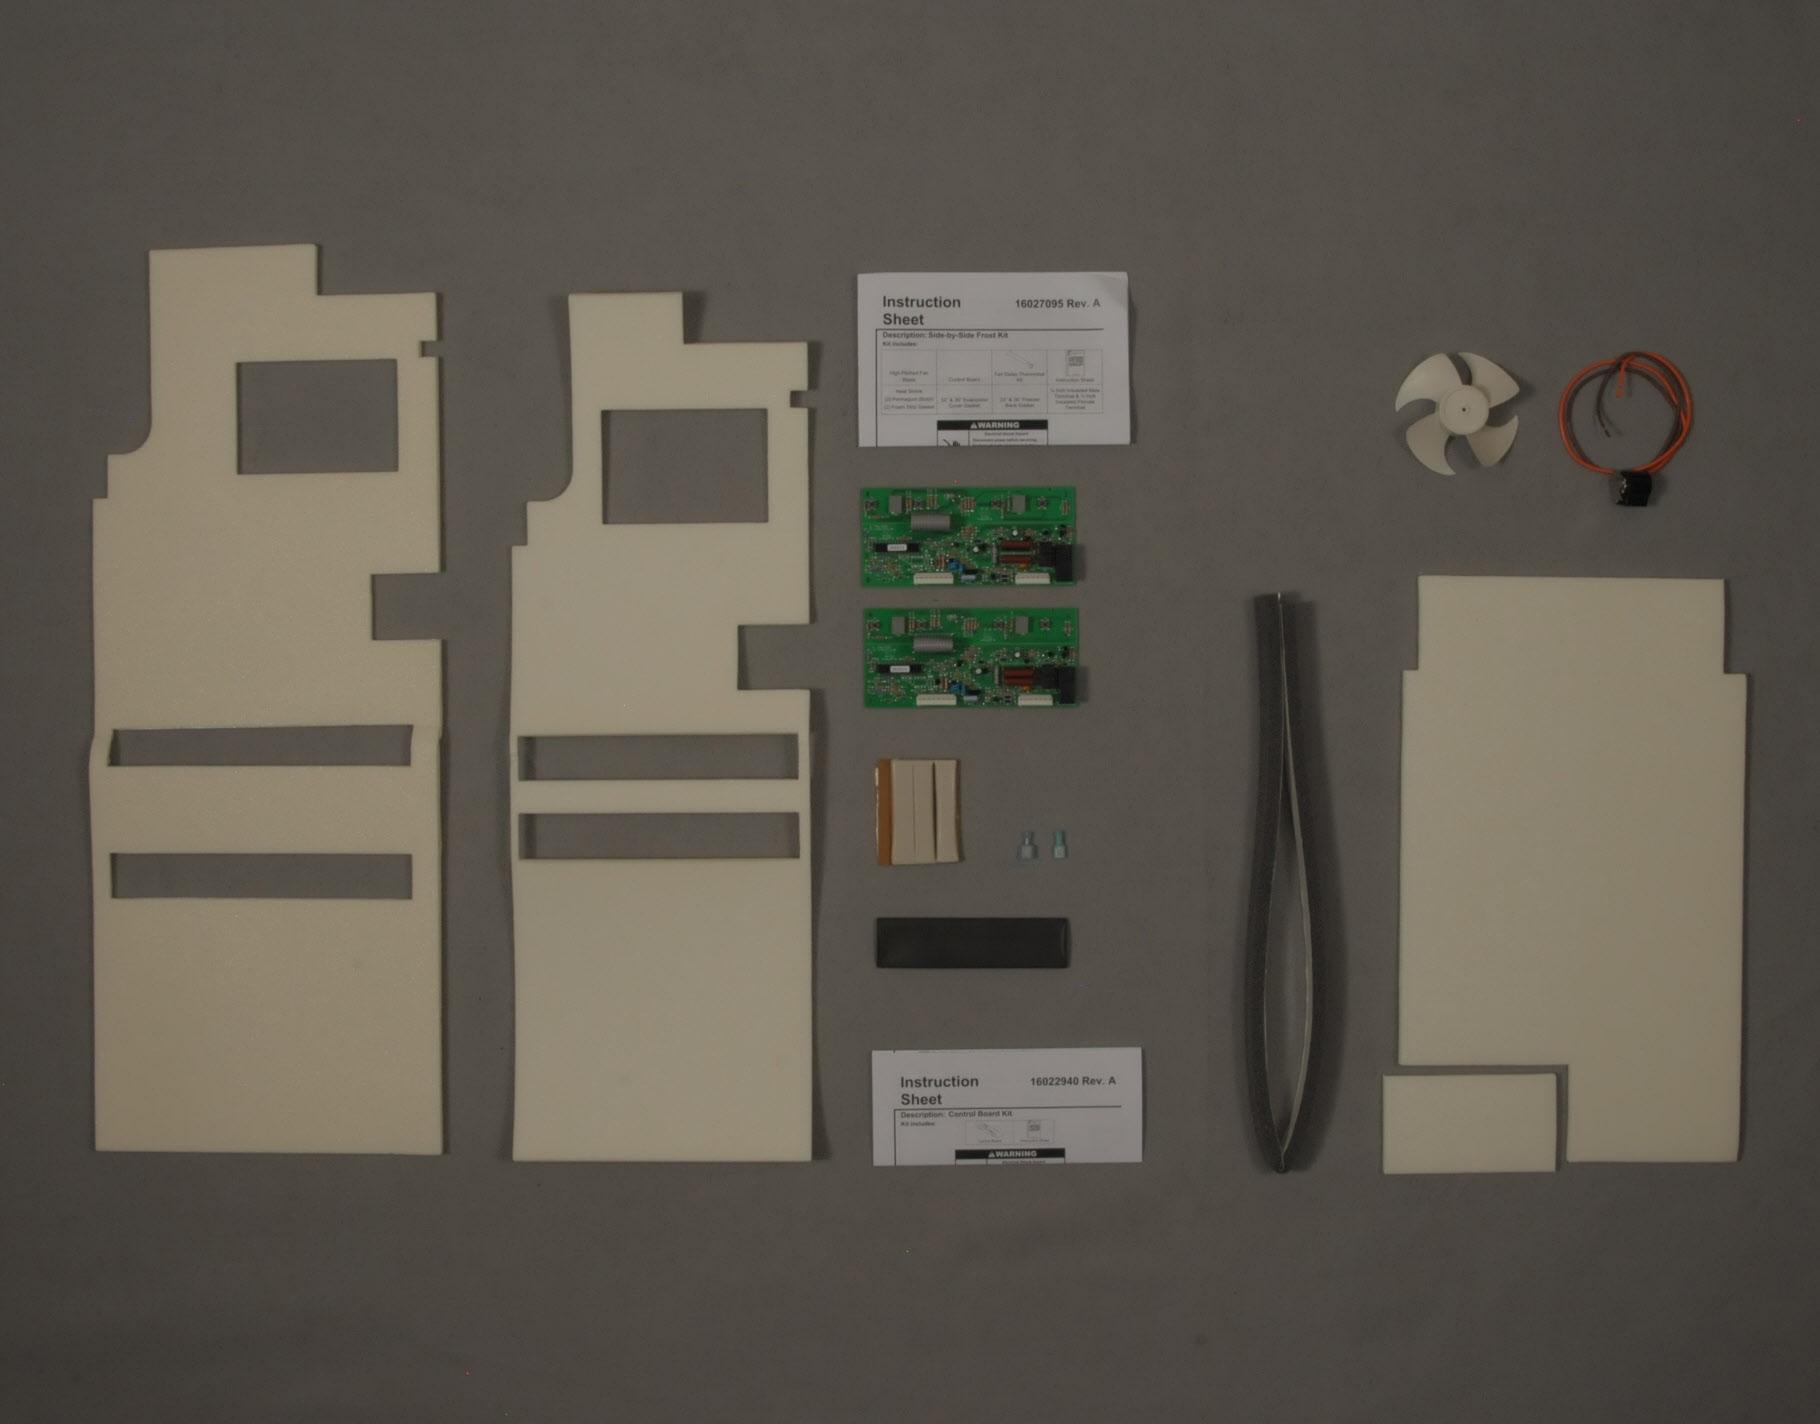 12002756 Whirlpool Refrigerator Part -Main Control Board